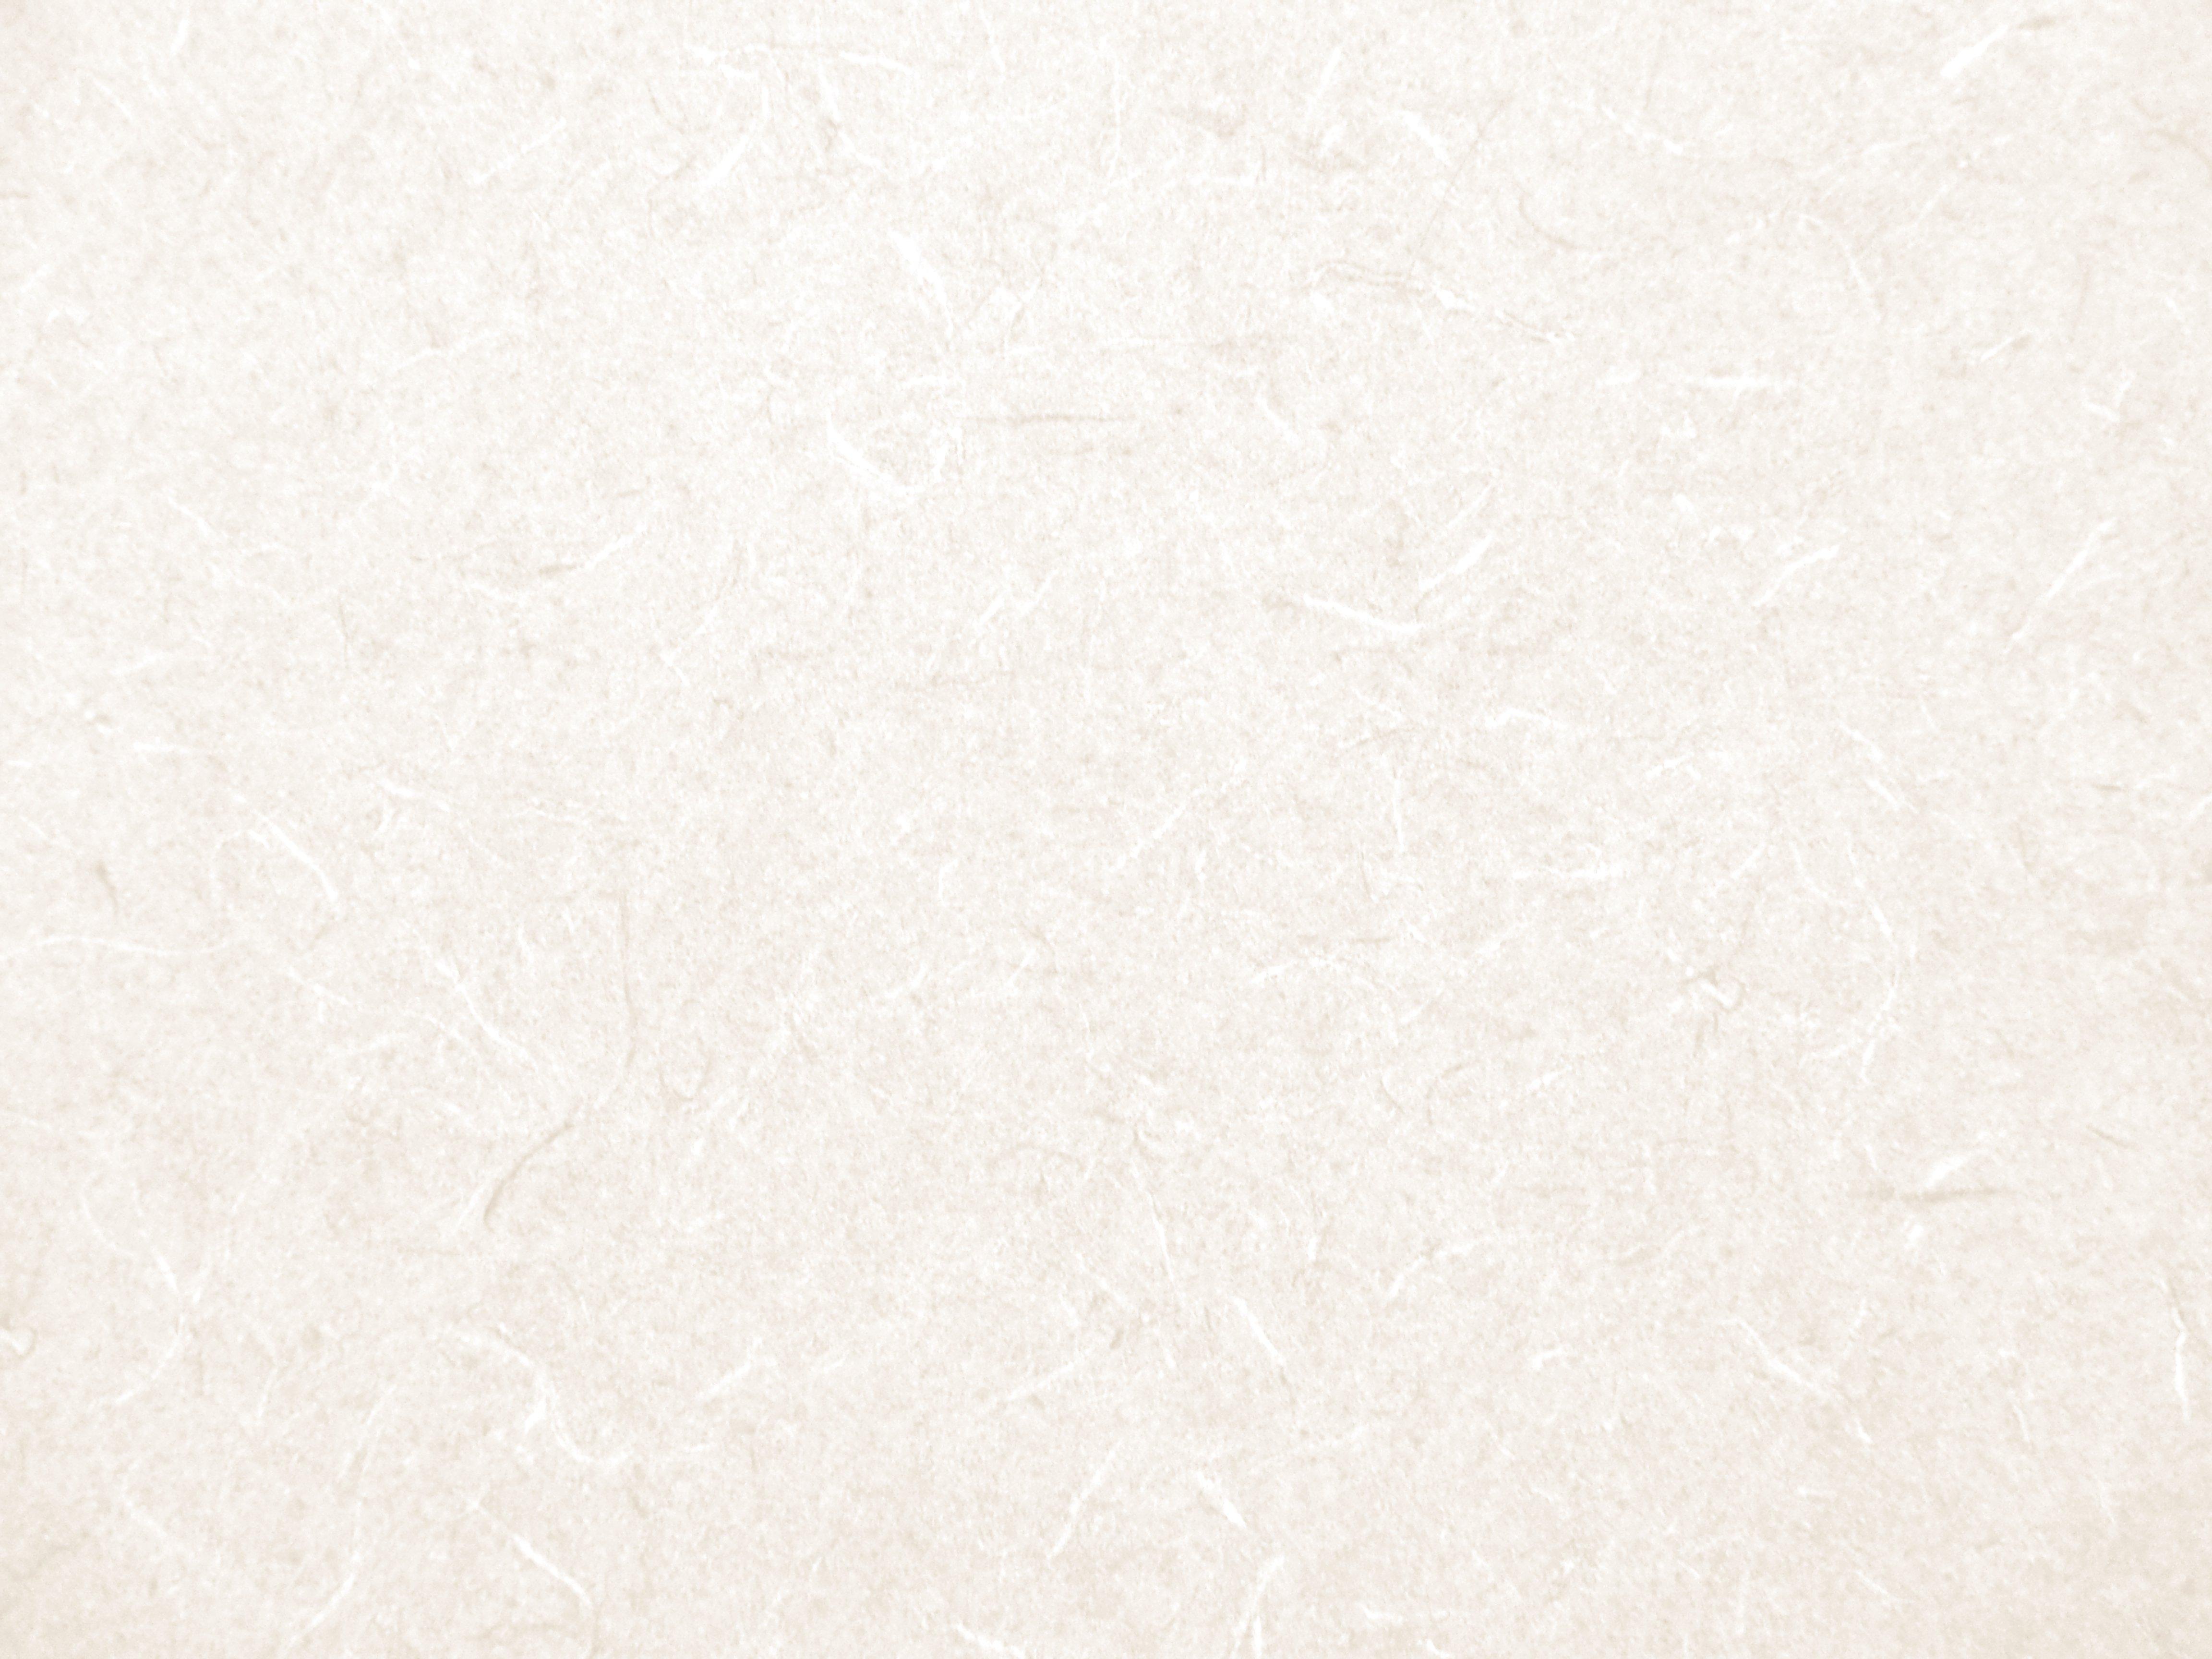 Damask Wall Sticker Cream And White Wallpaper Wallpapersafari